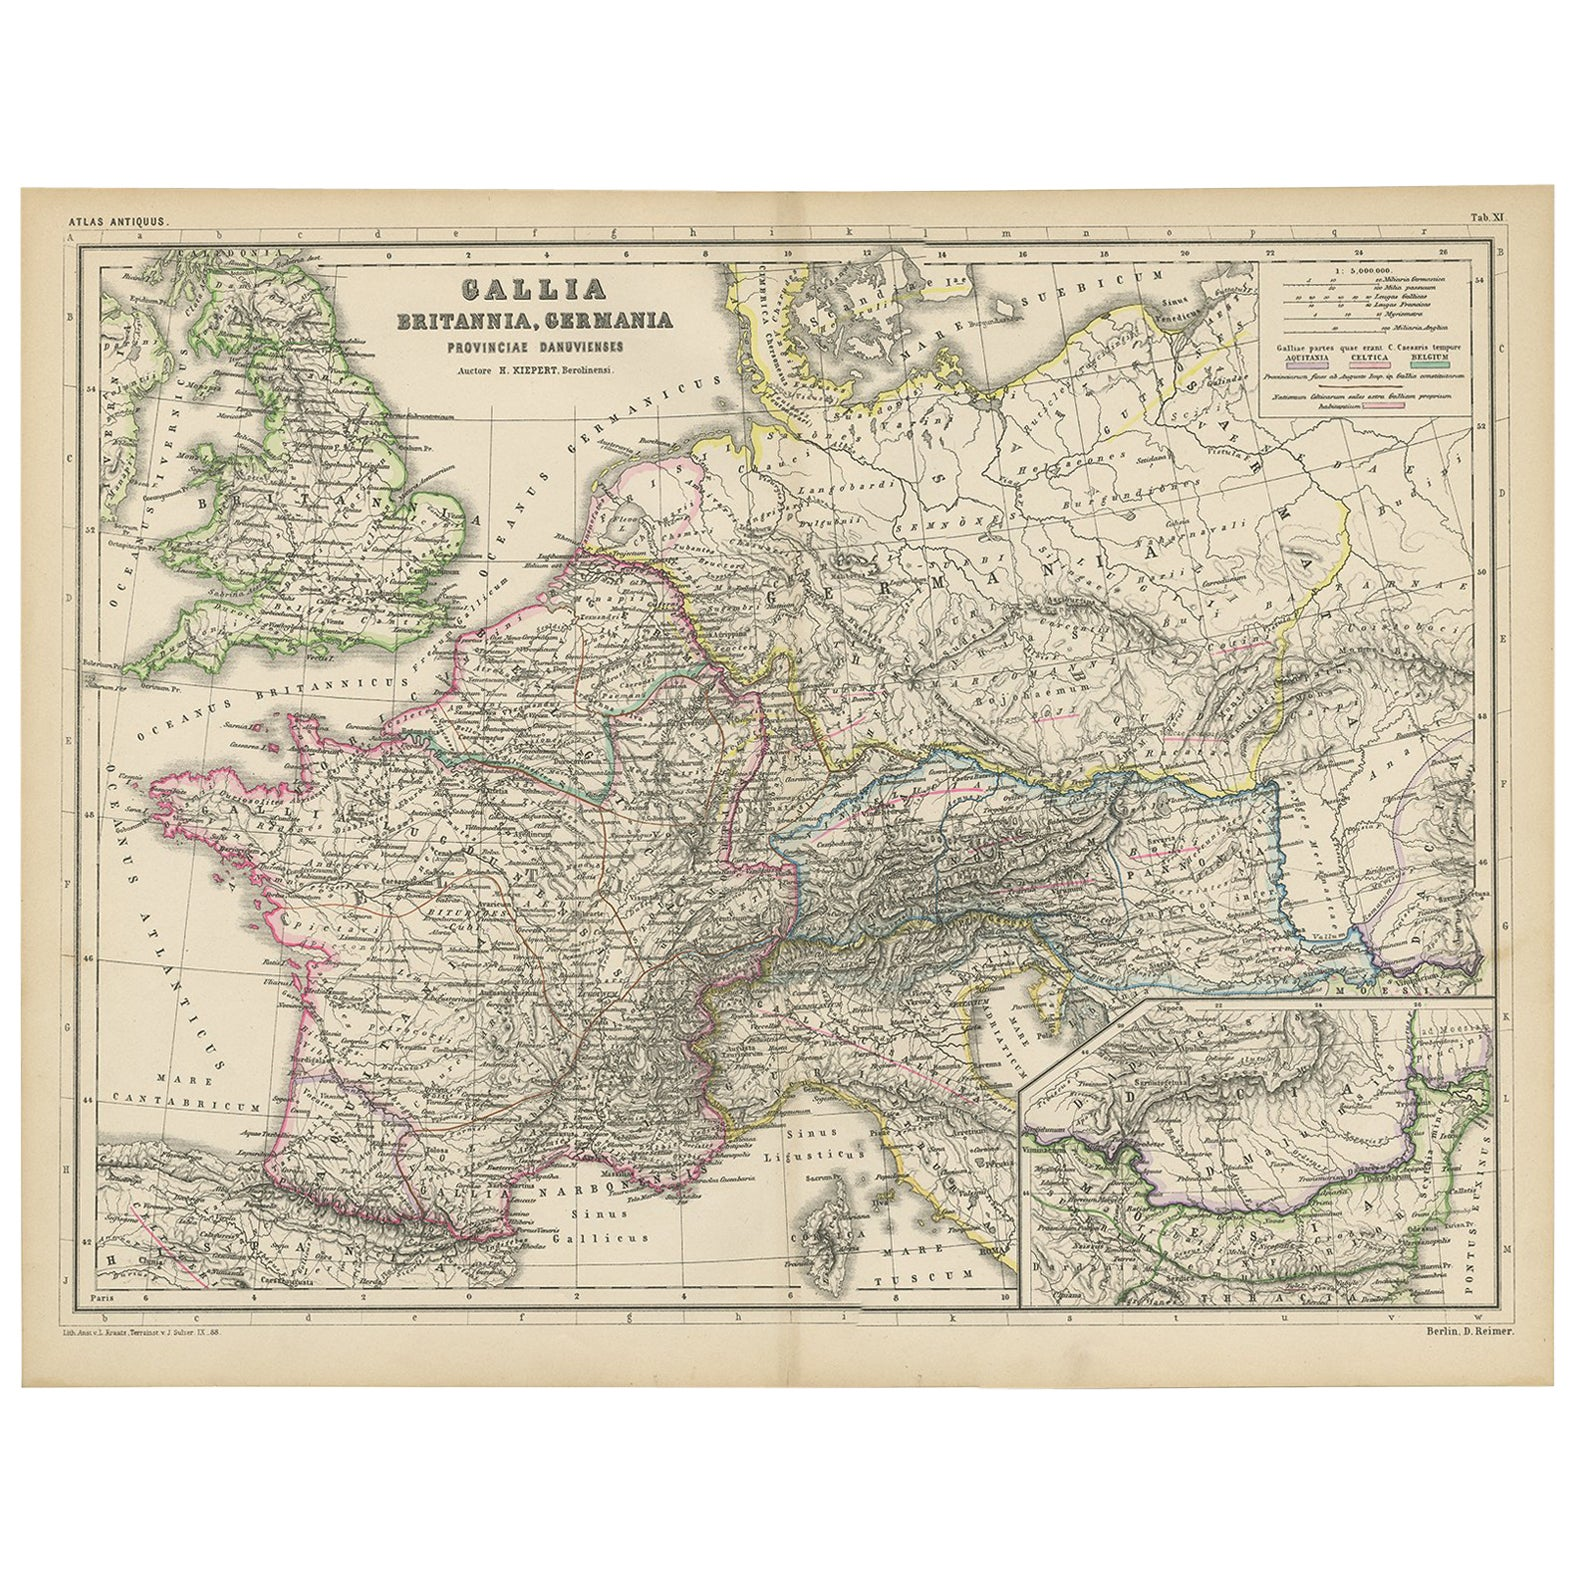 Antique Map of Western Europe by H. Kiepert, circa 1870